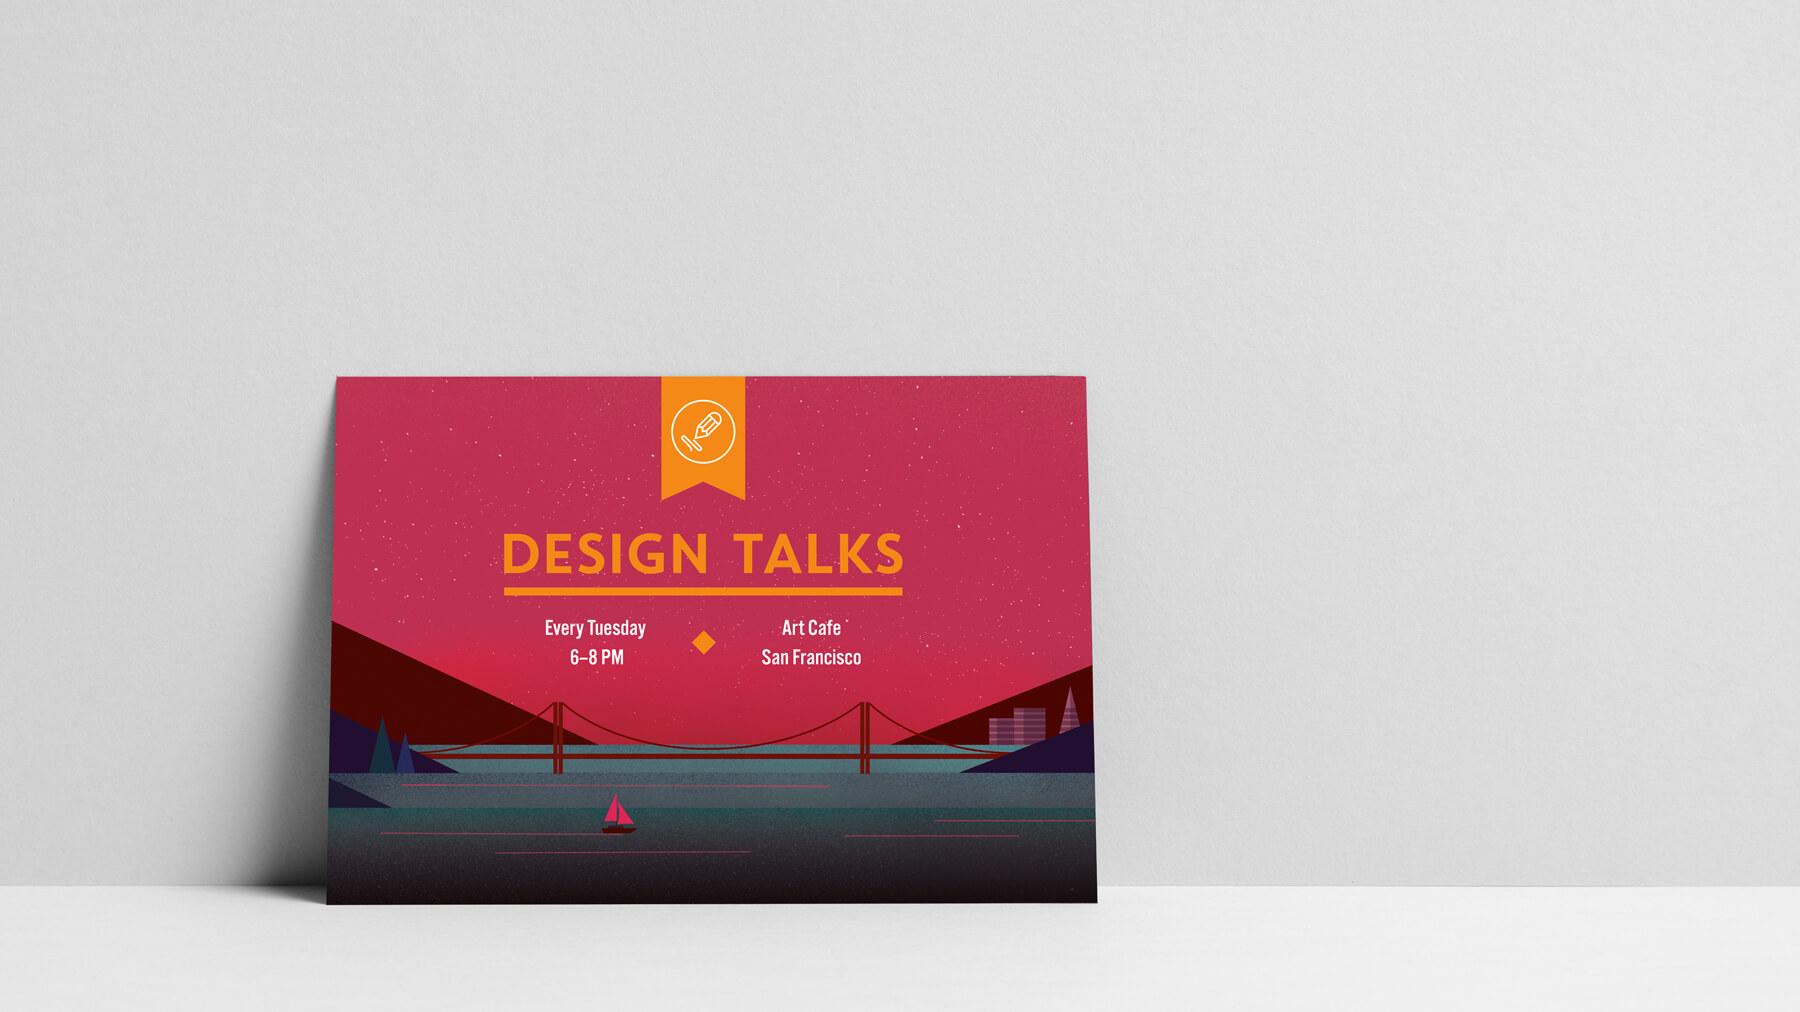 Create A Postcard In Indesign | Adobe Indesign Tutorials Regarding Birthday Card Indesign Template